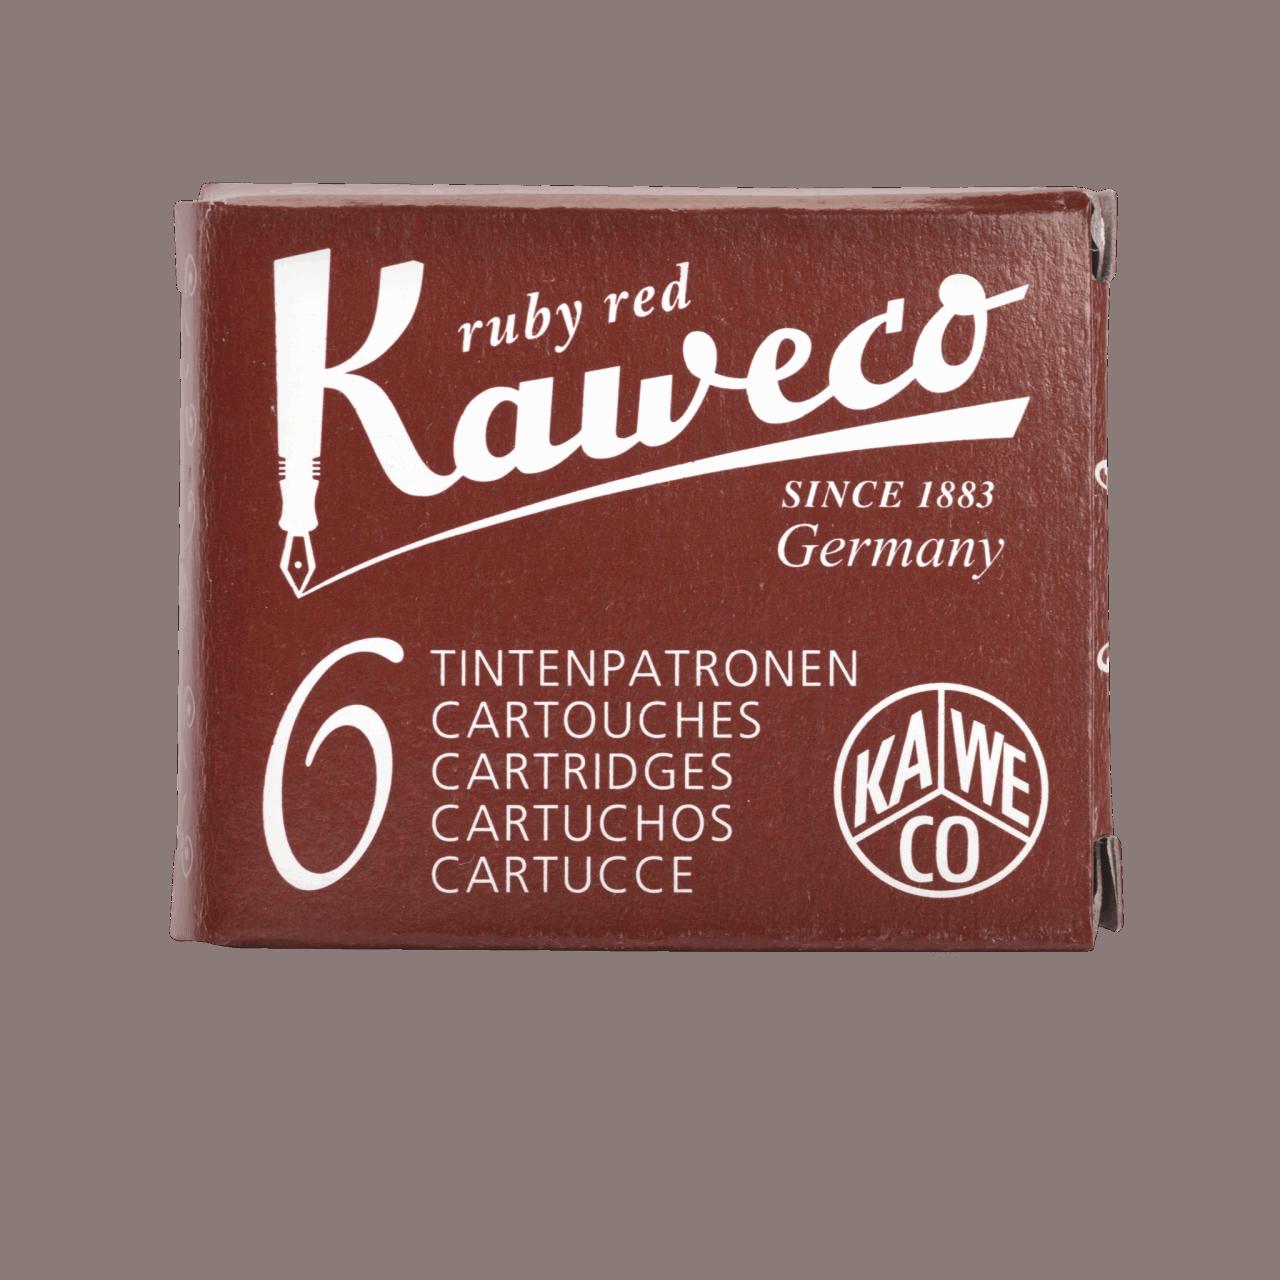 Kaweco Tintenpatronen 6 Stück - Rubinrot